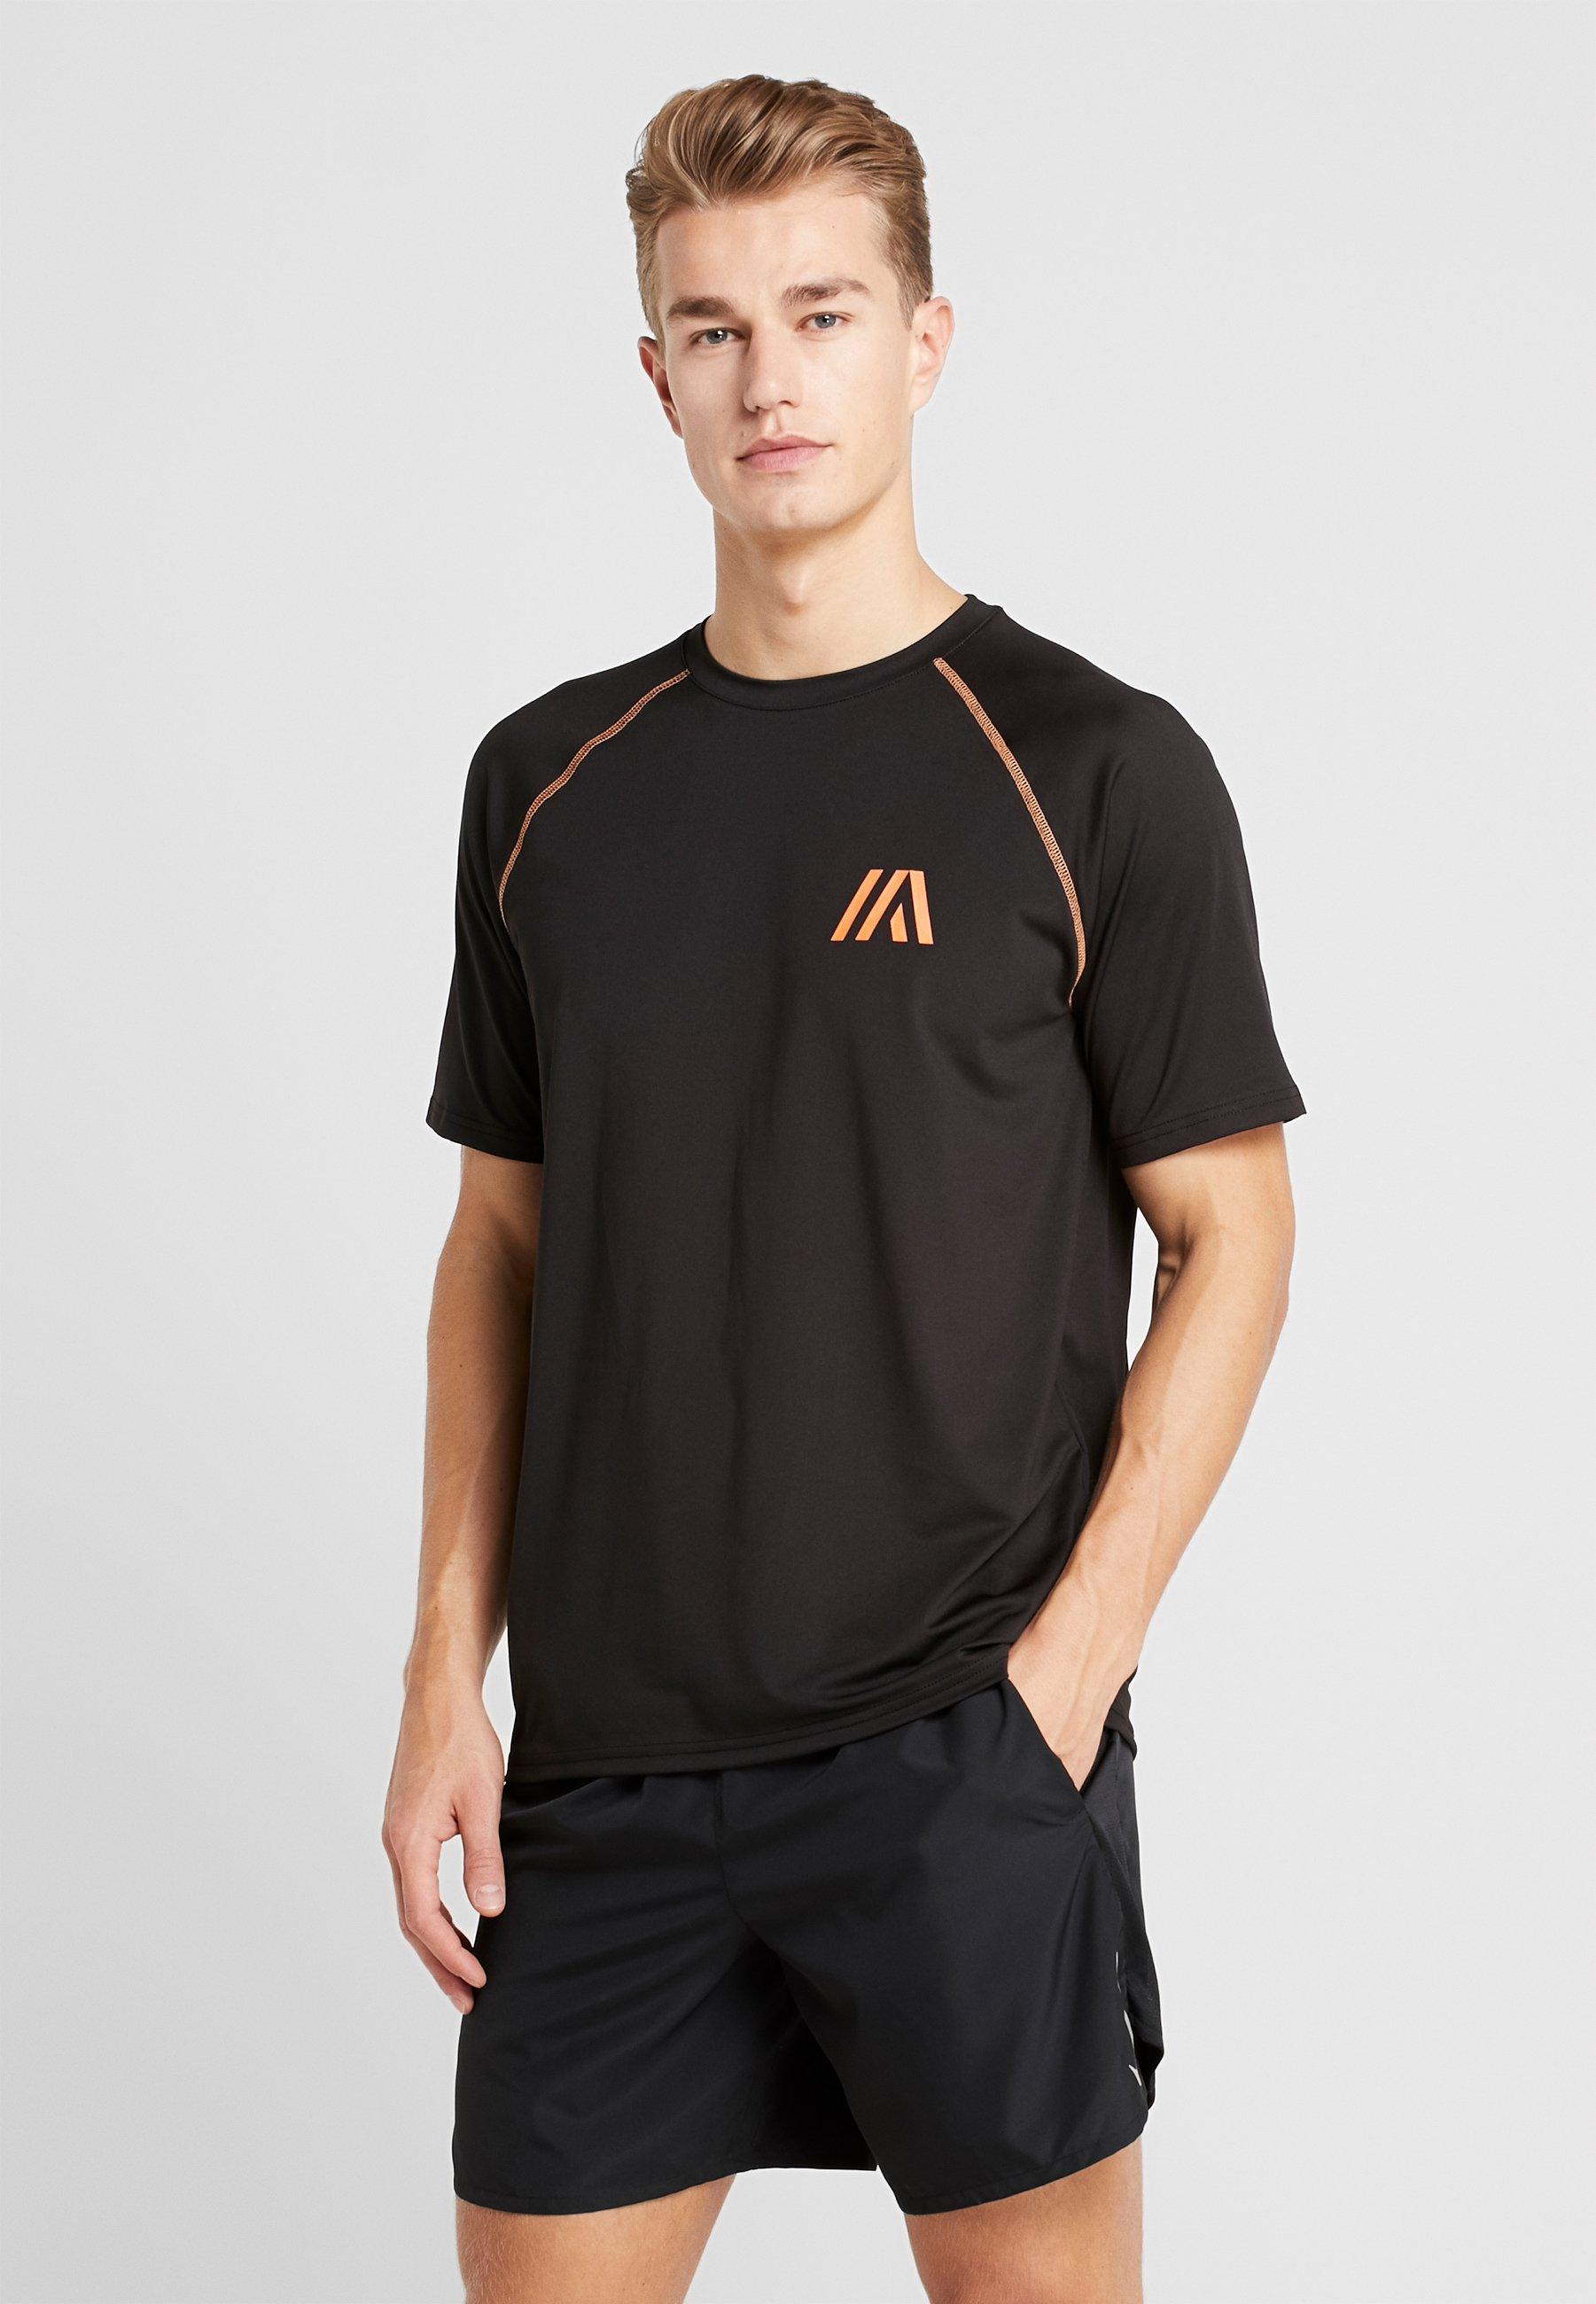 ImpriméBlack Your Turn Active shirt T byYf7gImv6